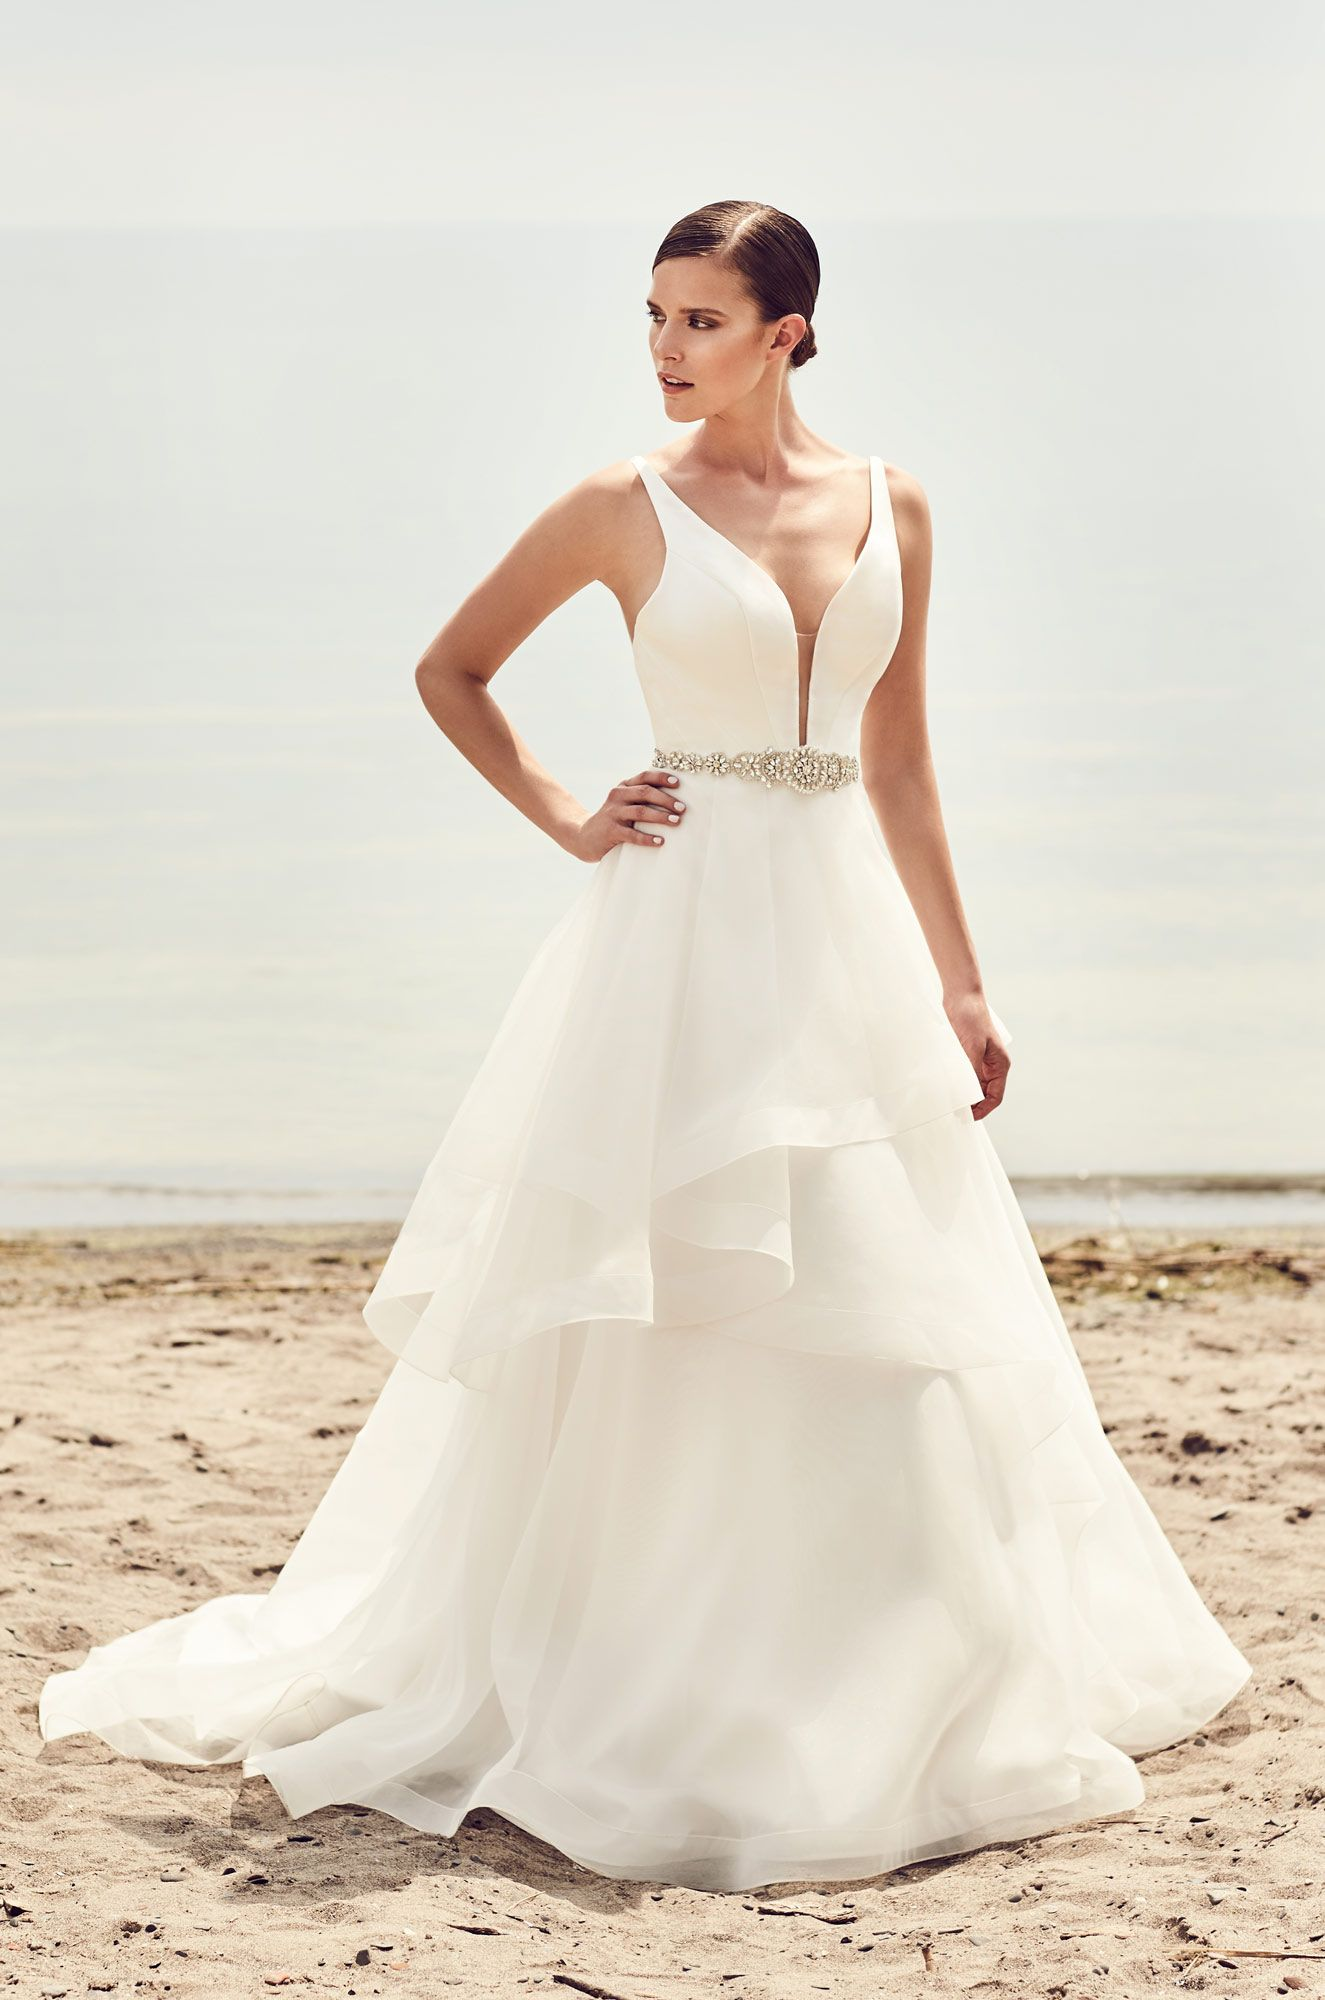 3b48cfebbde Tiered Organza Skirt Wedding Dress - Style  2112 in 2019